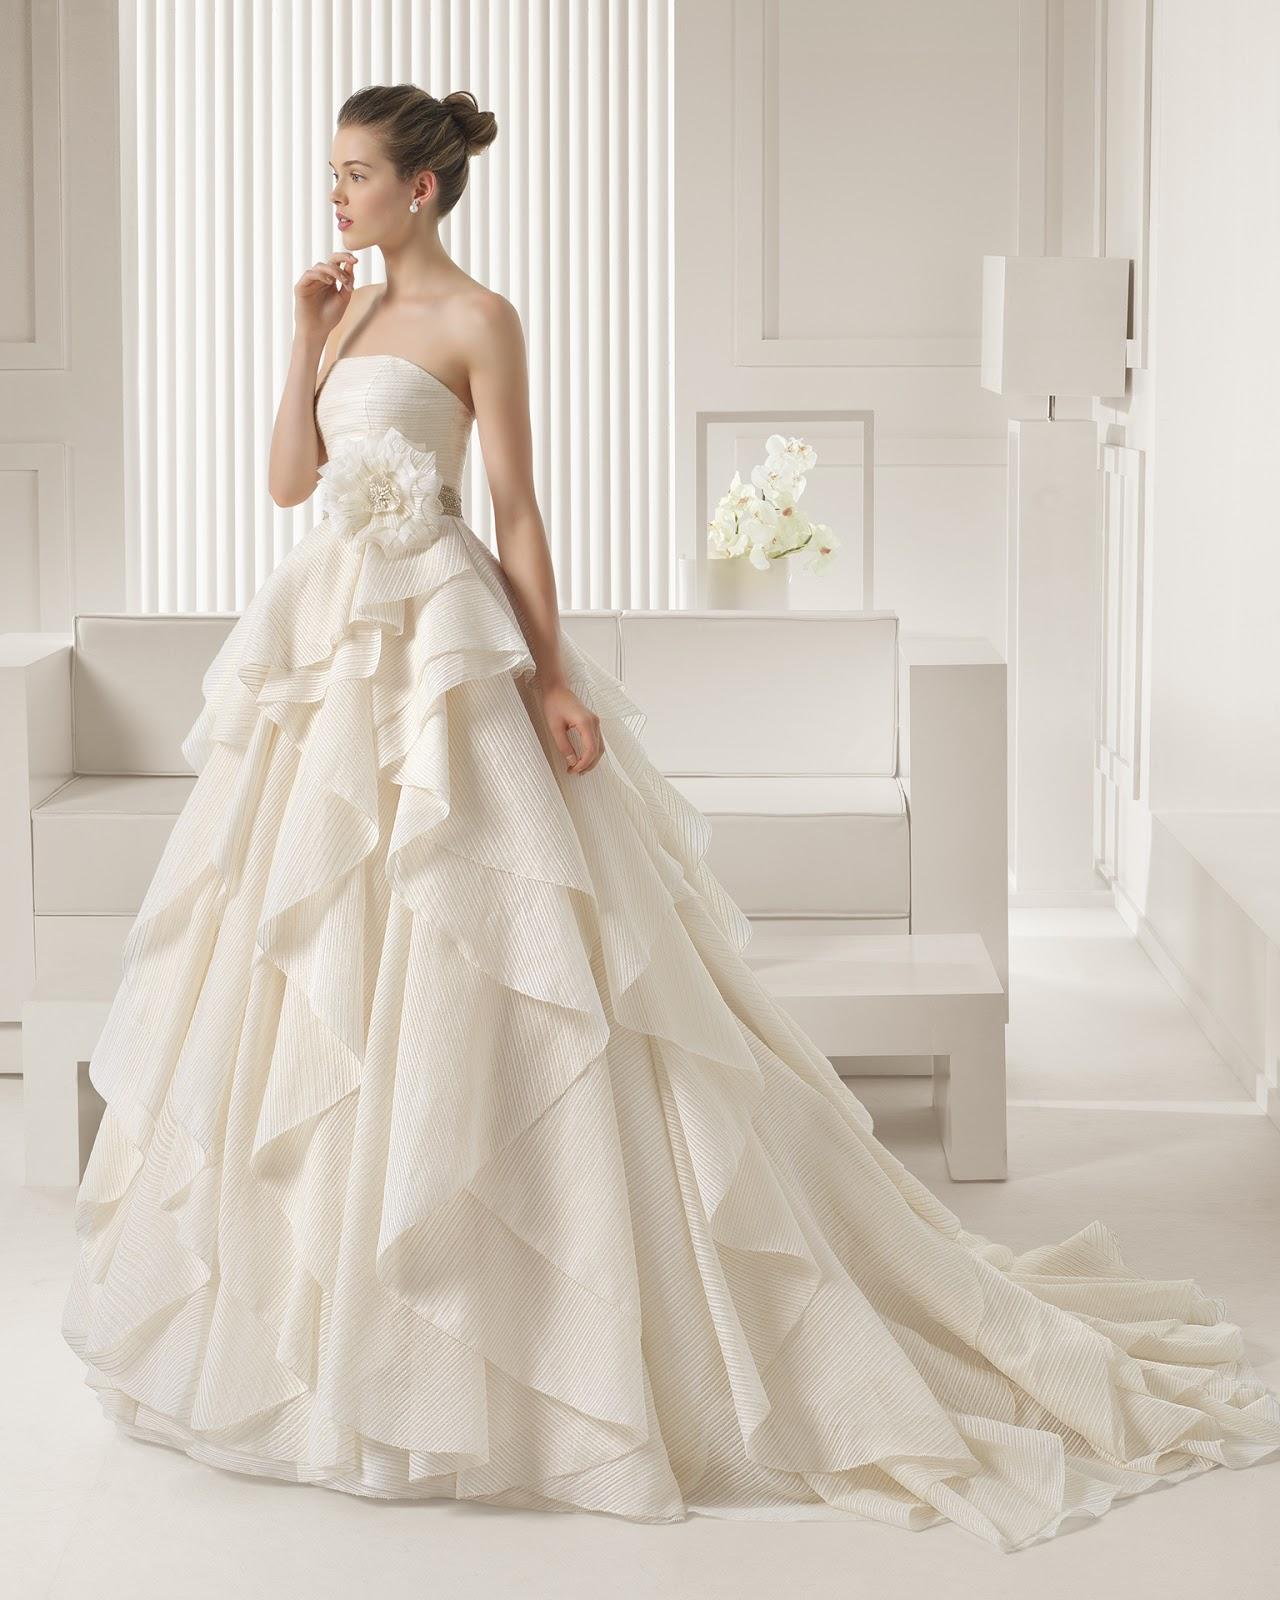 wedding dresses cold climates: Best Wedding Dresses 2015